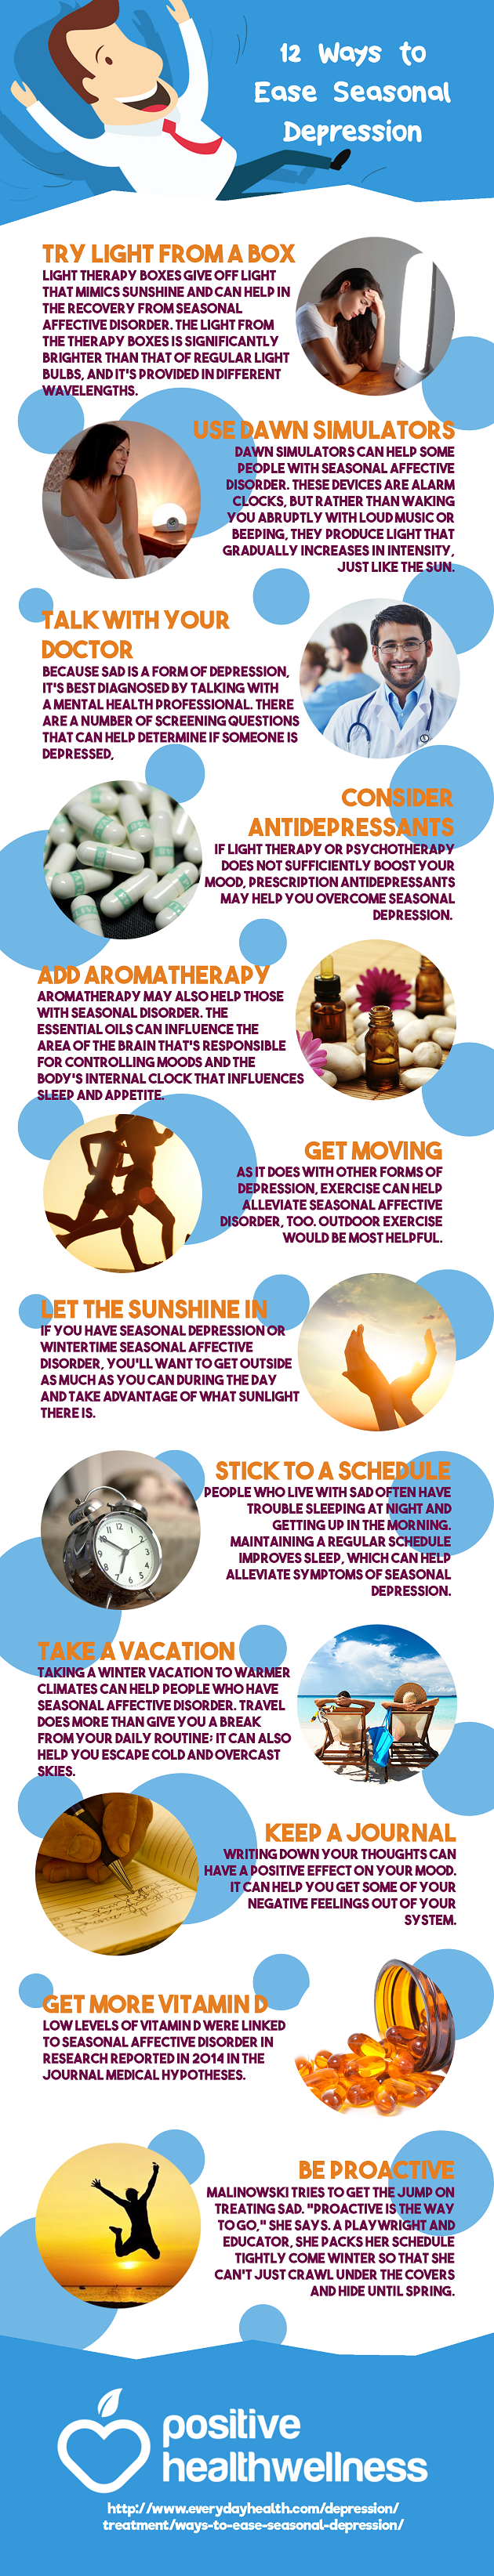 12 Ways to Ease Seasonal Depression